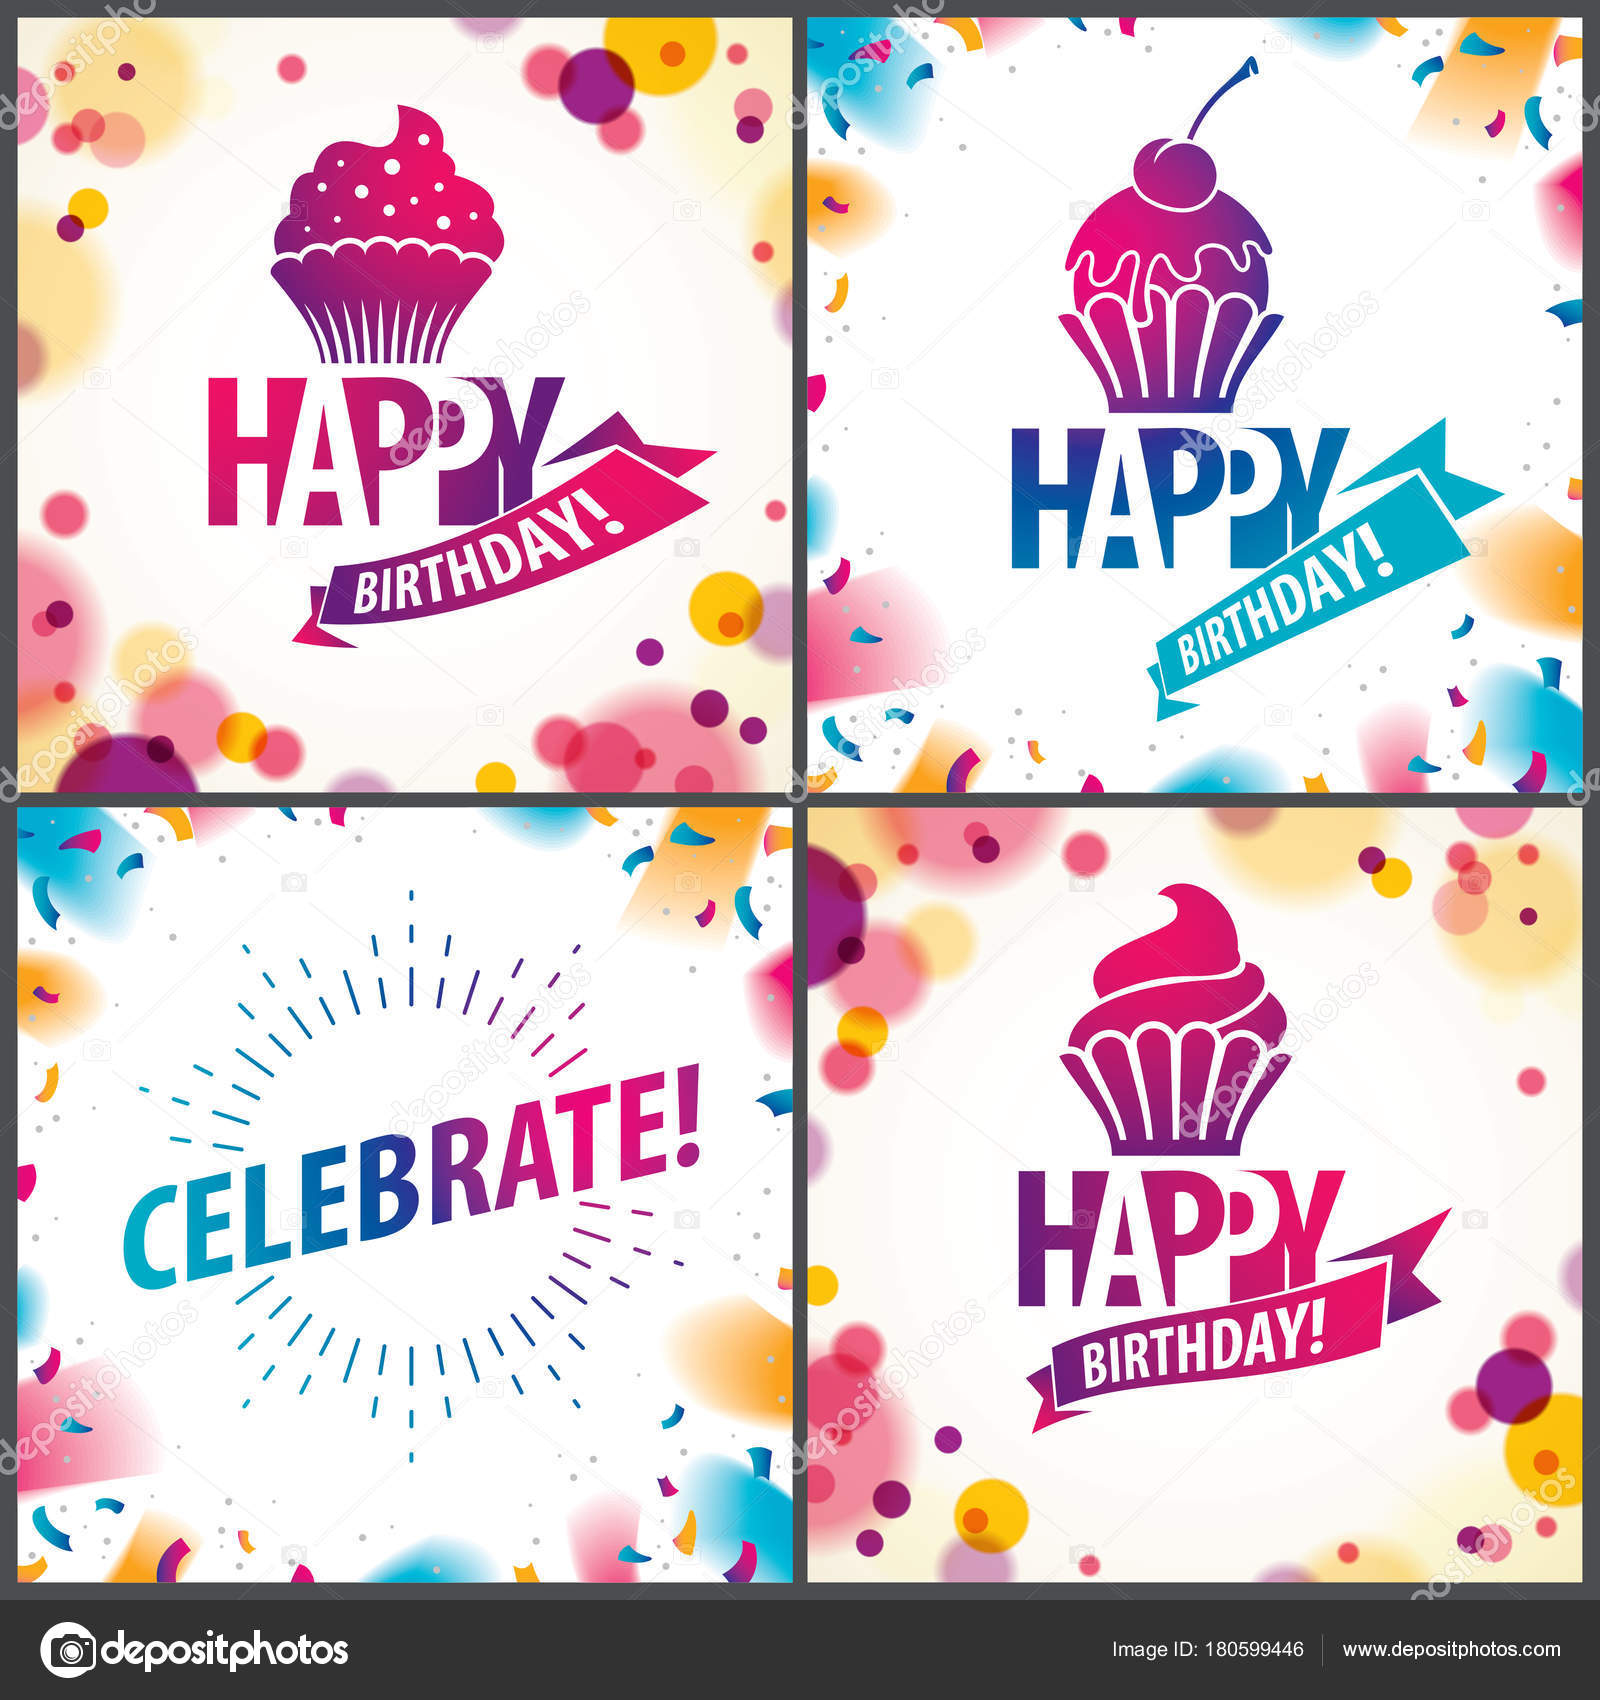 Happy birthday joyful bright vector greeting cards set stock happy birthday joyful bright vector greeting cards set stock vector m4hsunfo